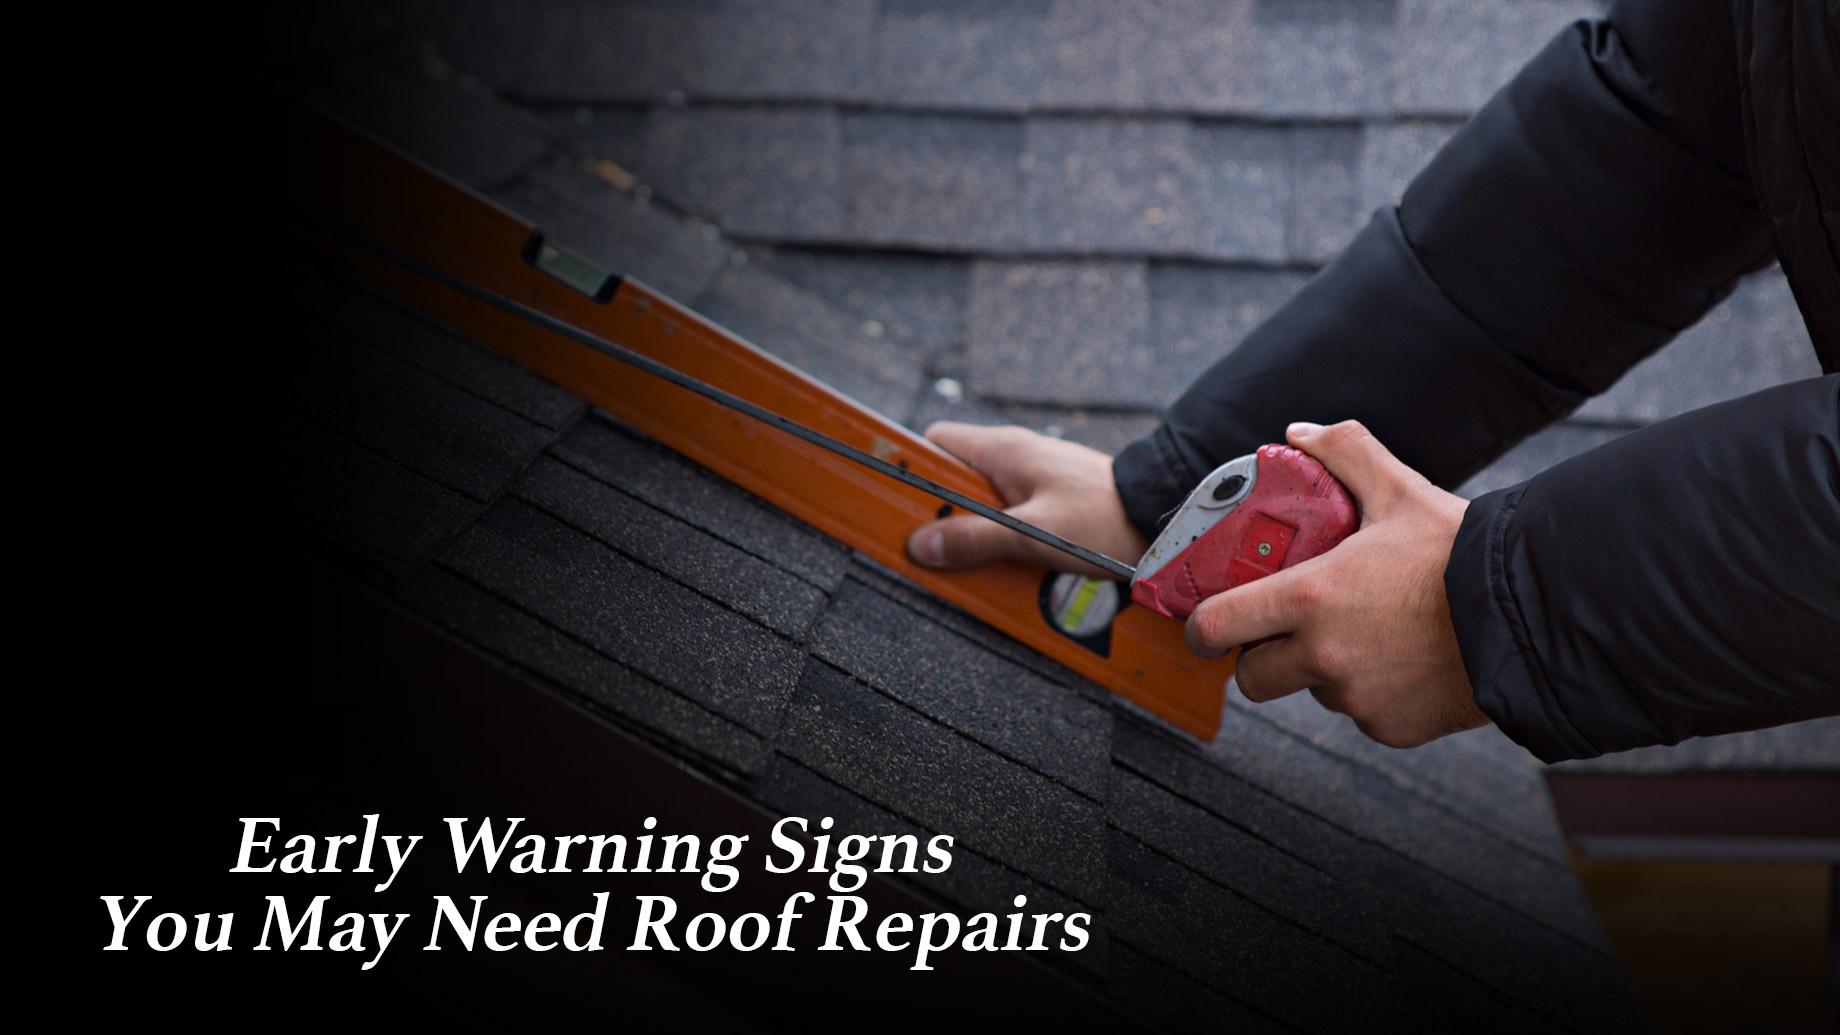 Early Warning Signs You May Need Roof Repairs